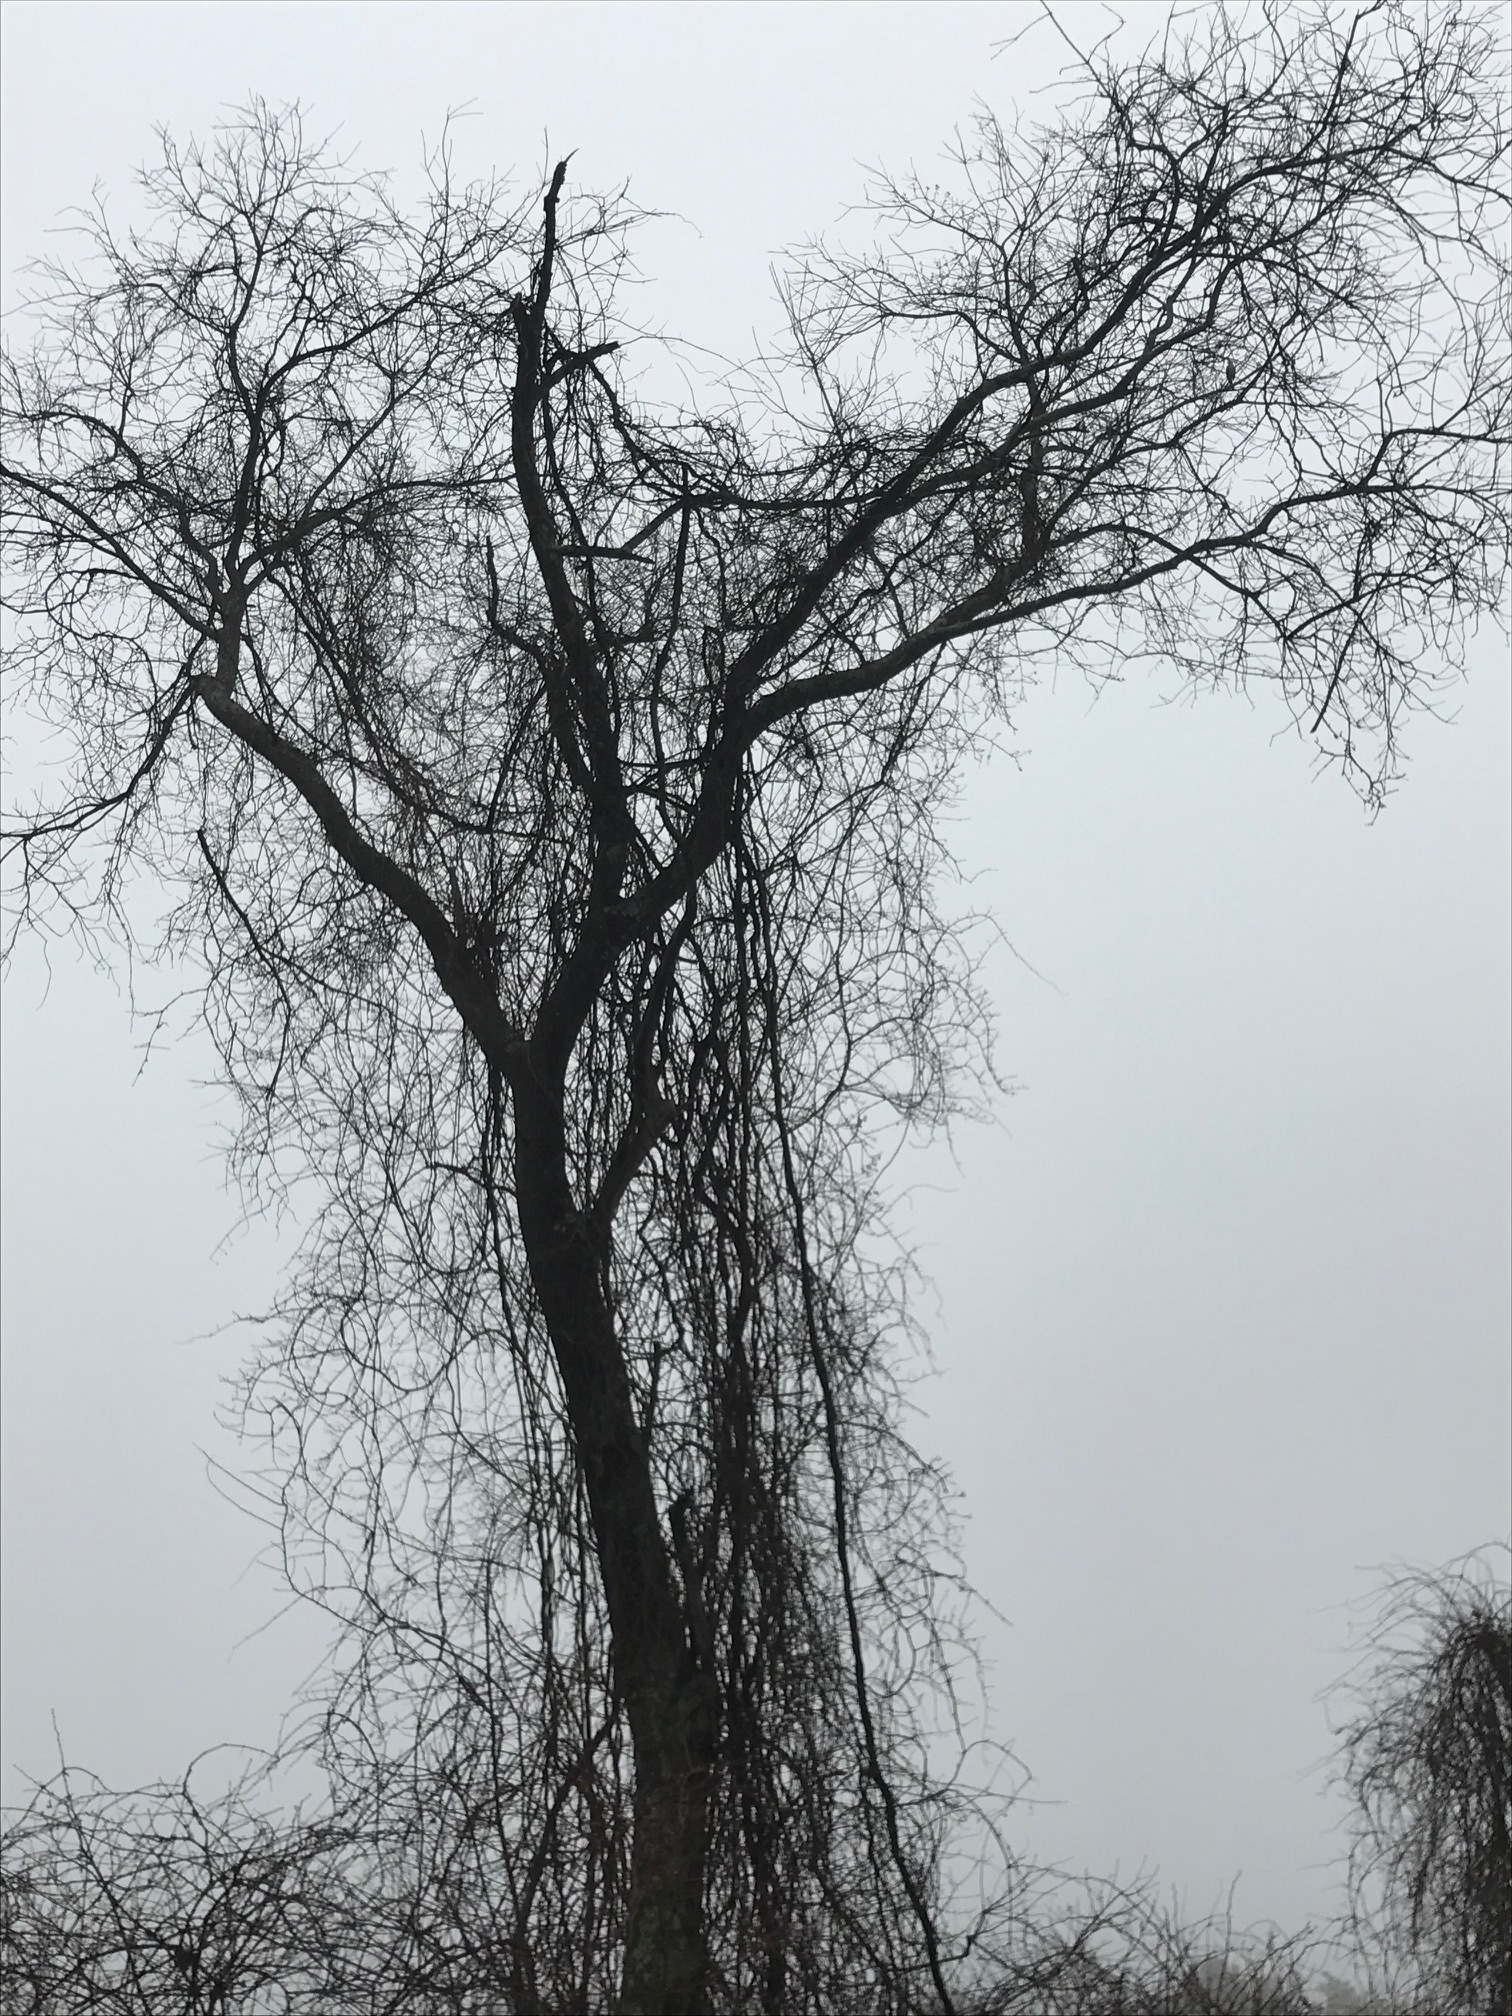 A Meadow, A Tree